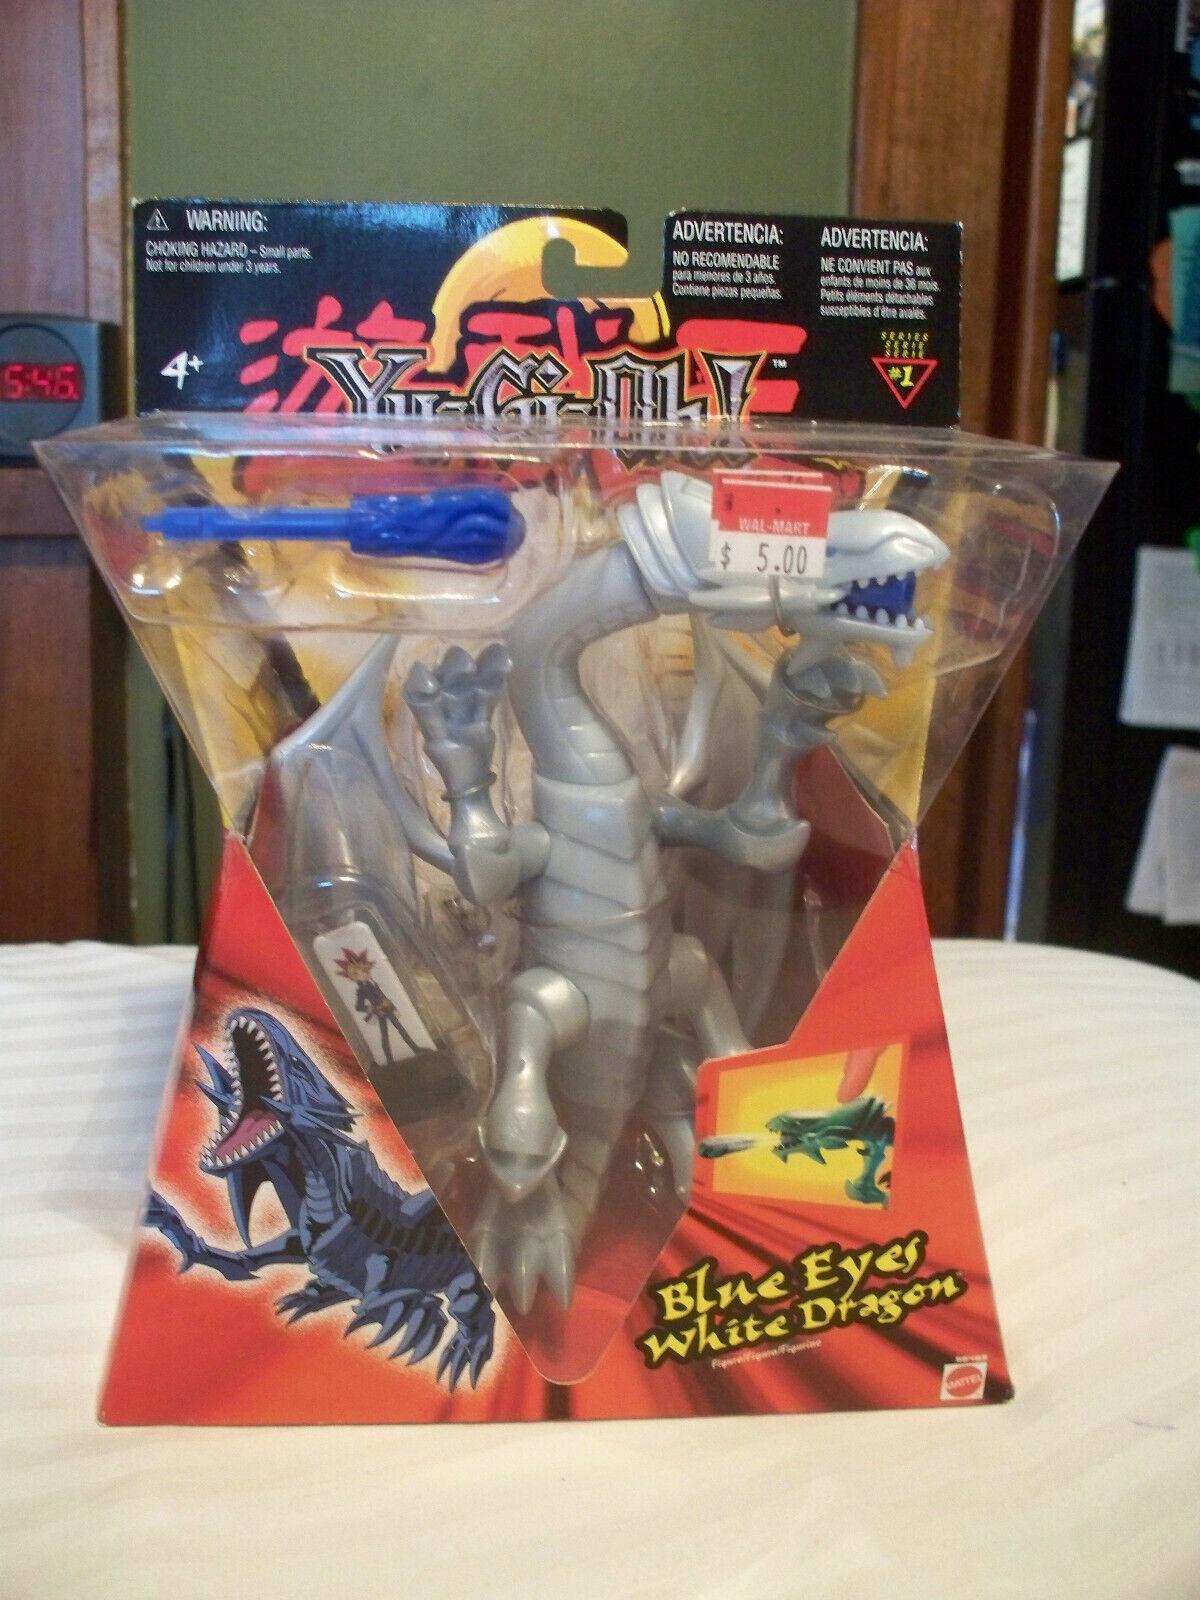 2002 Yu-Gi-Oh  Mattel bleu Eyes blanc Dragon série 1 figurine scellé jamais retiré de la boîte